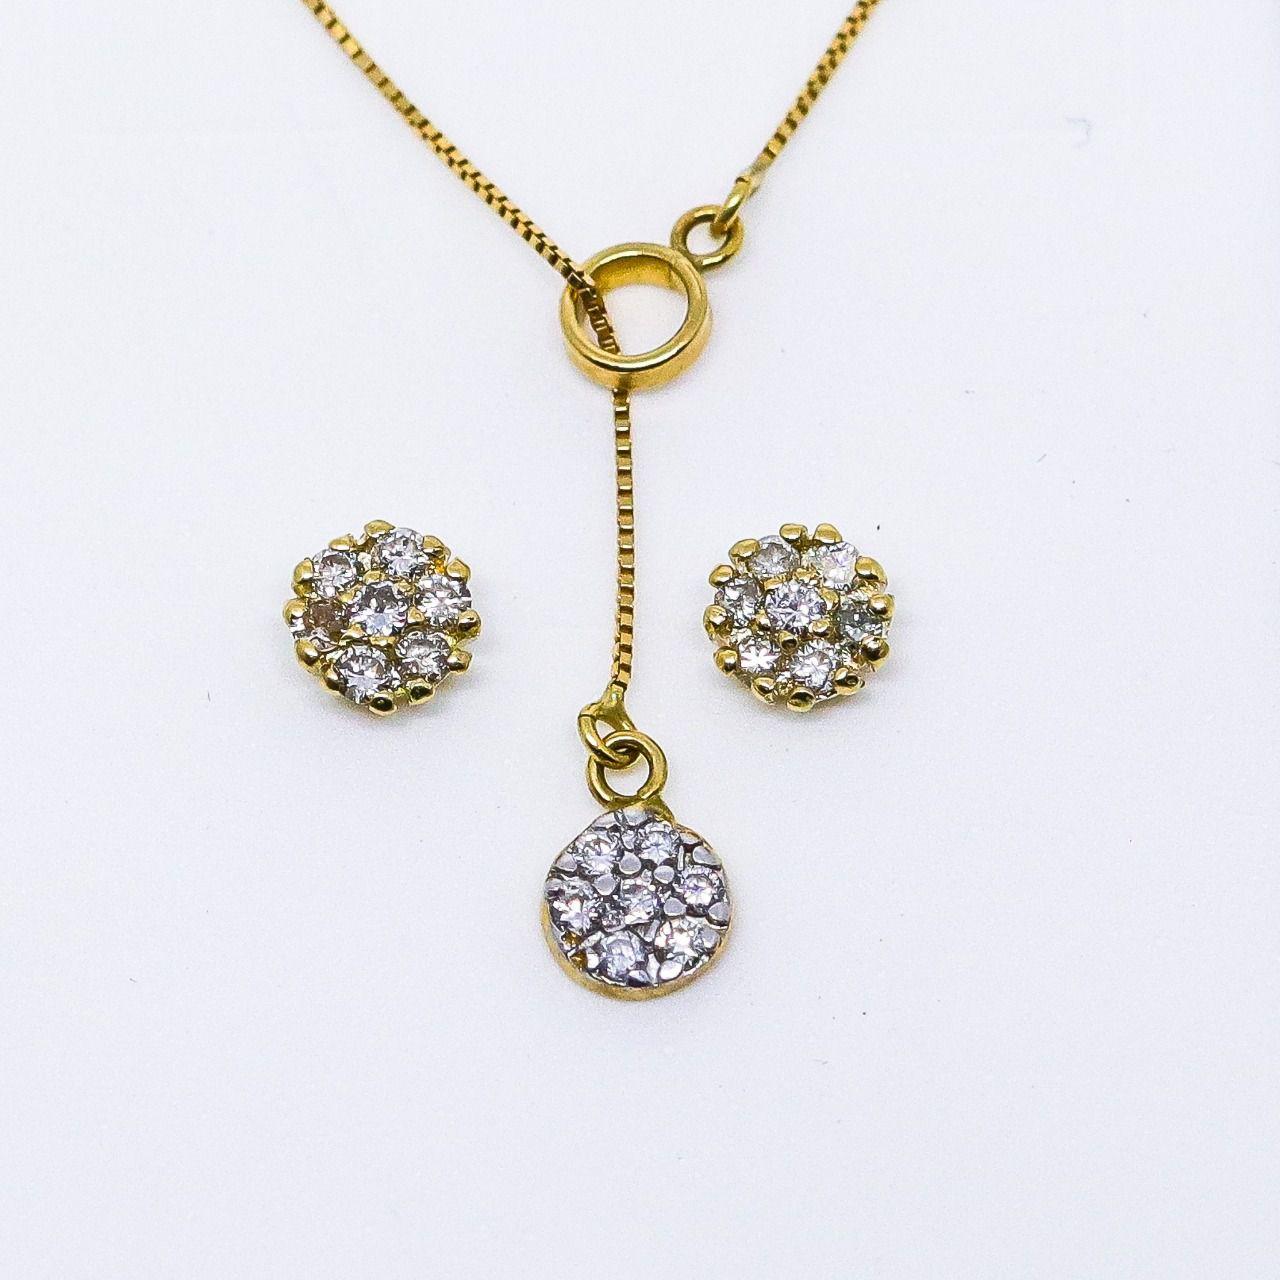 Gargantilha ouro 18k gravata veneziana com 7 diamantes 1,5pts